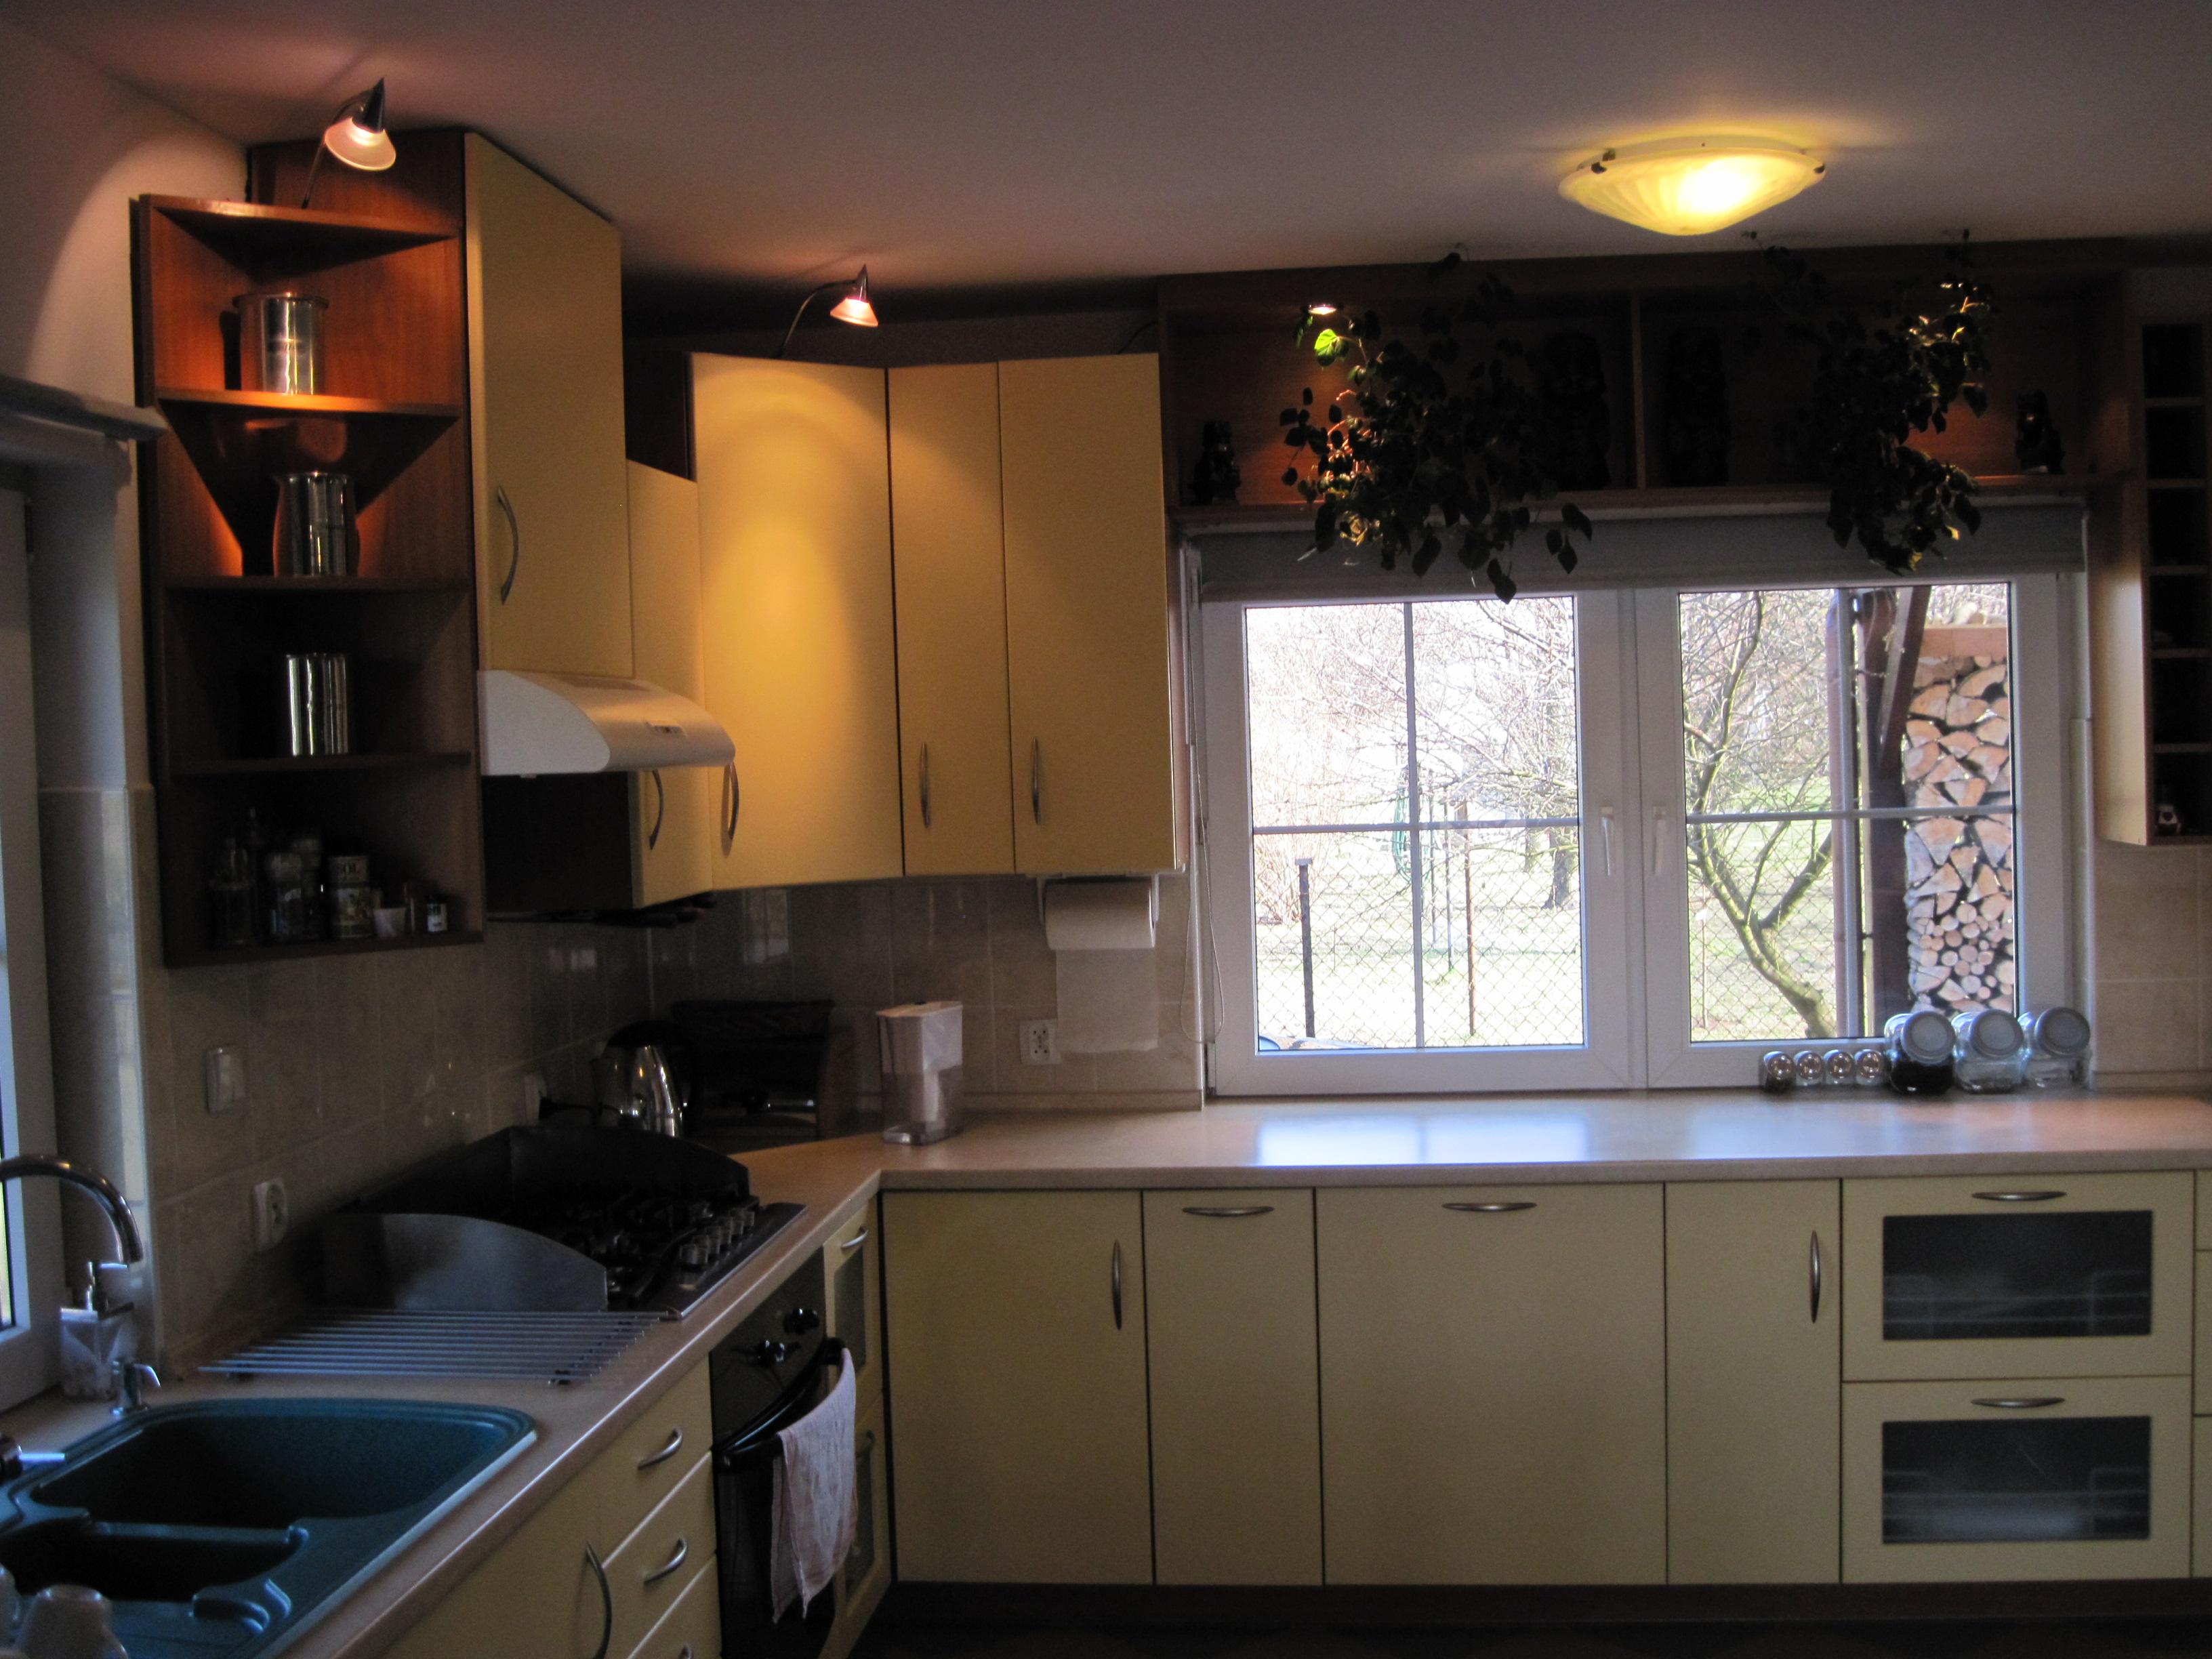 Projekt kuchni z salonem kuchnia na wymiar warszawa for Projekty kuchni z salonem